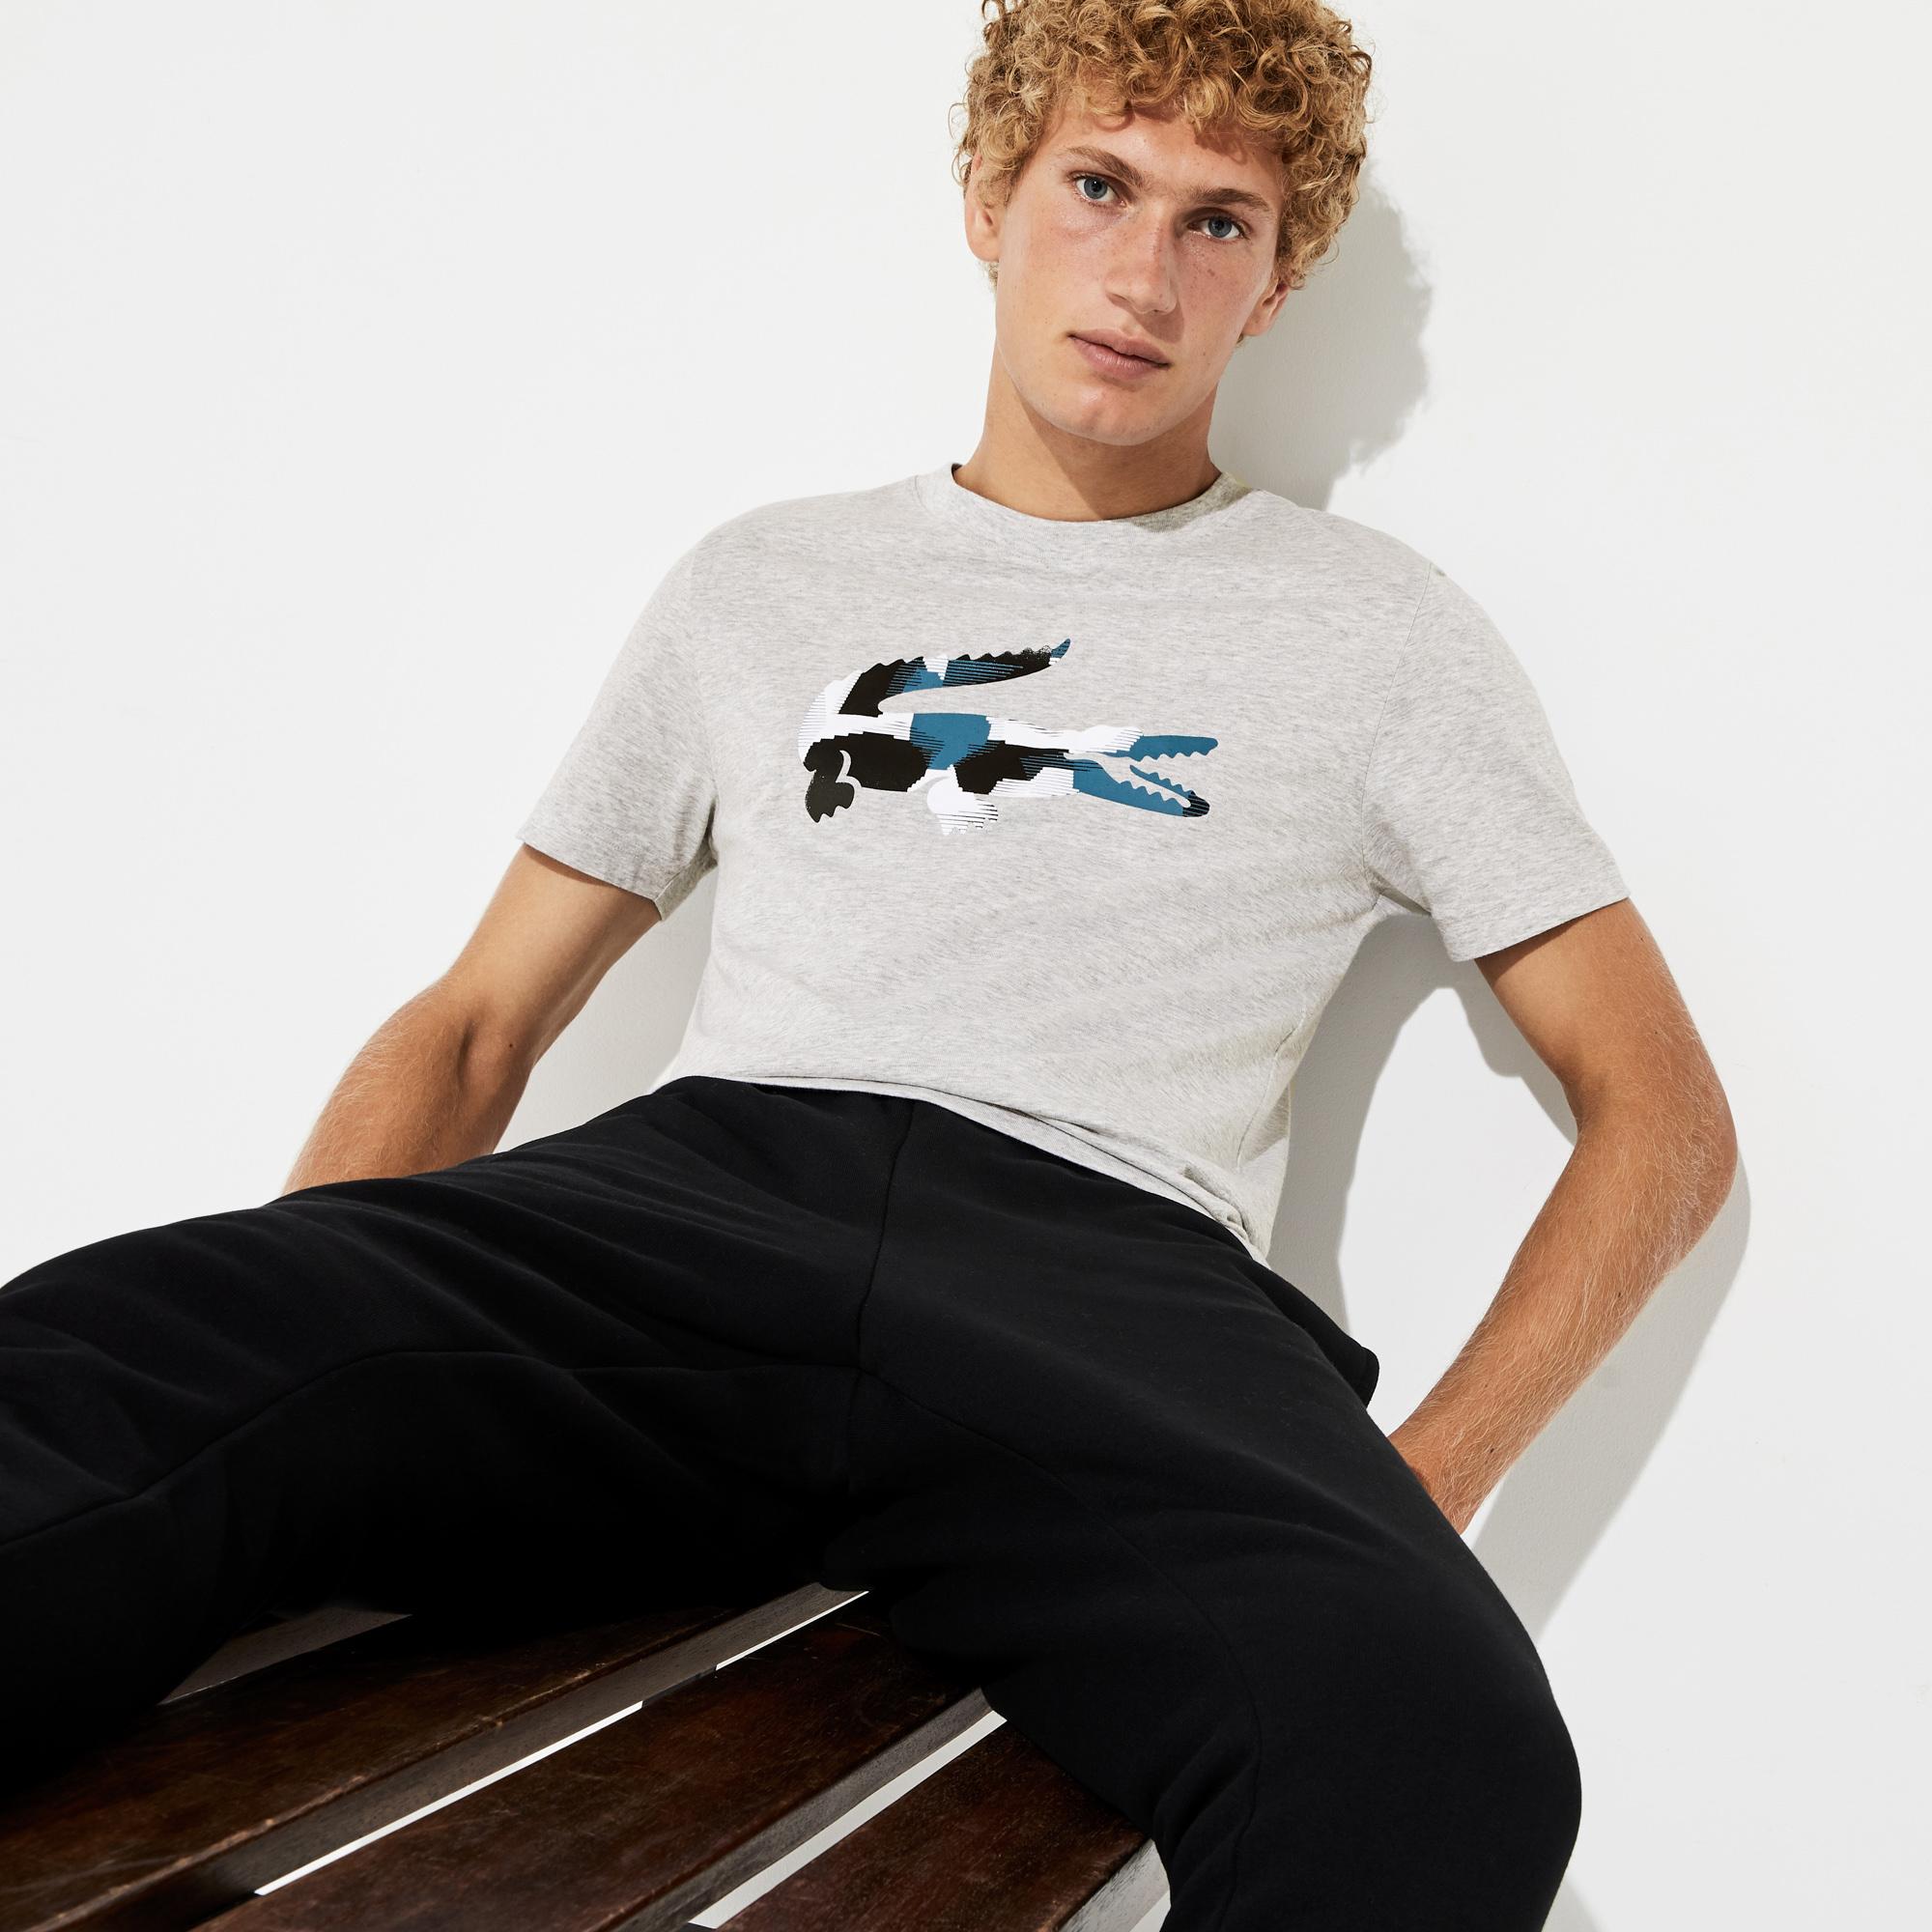 Lacoste Sport Men's Camouflage Print Crocodile Jersey T-Shirt